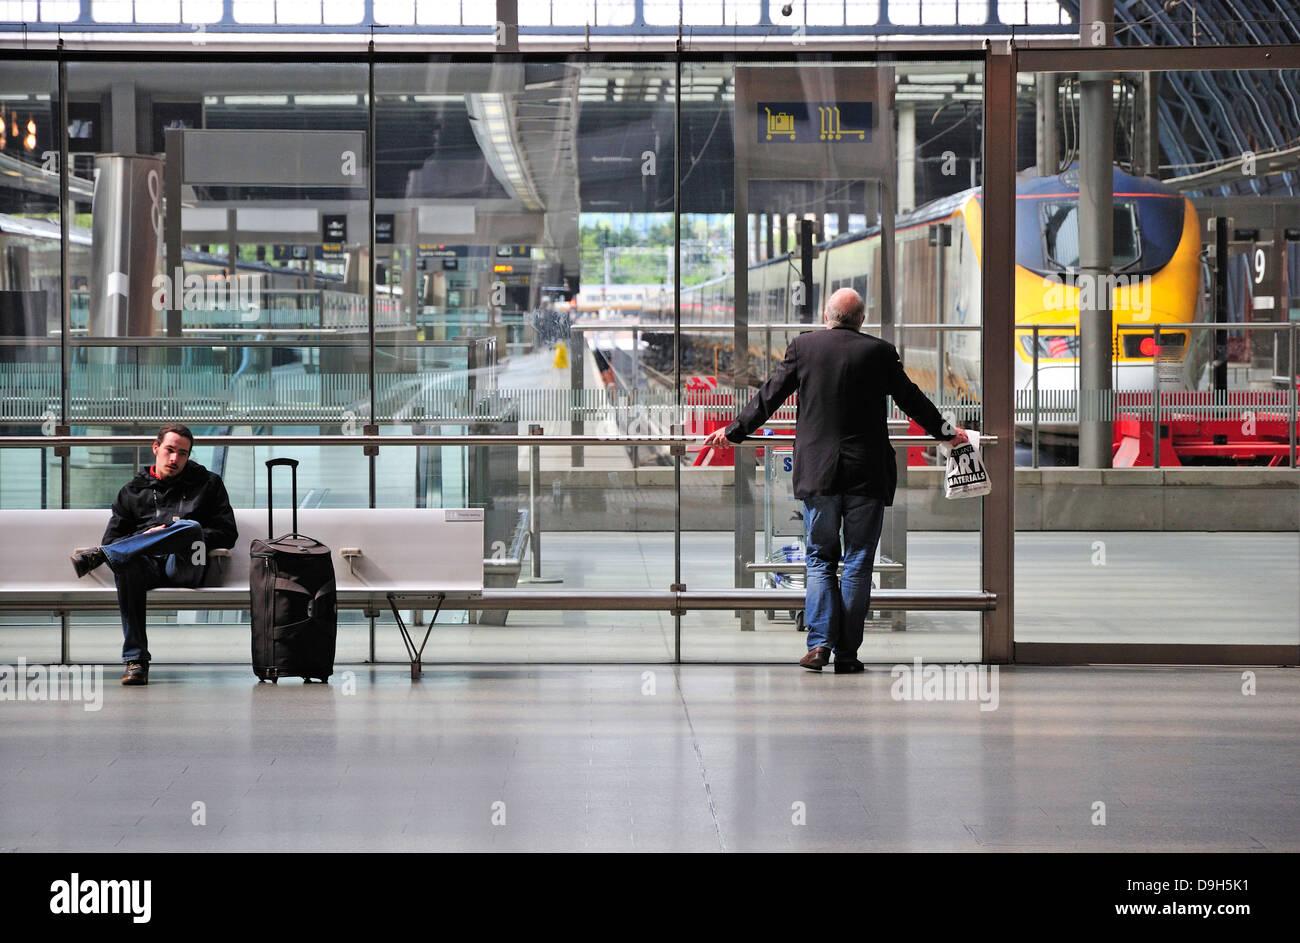 London, England, UK. St Pancras International Railway Station. Two men waiting by Eurostar terminal - Stock Image